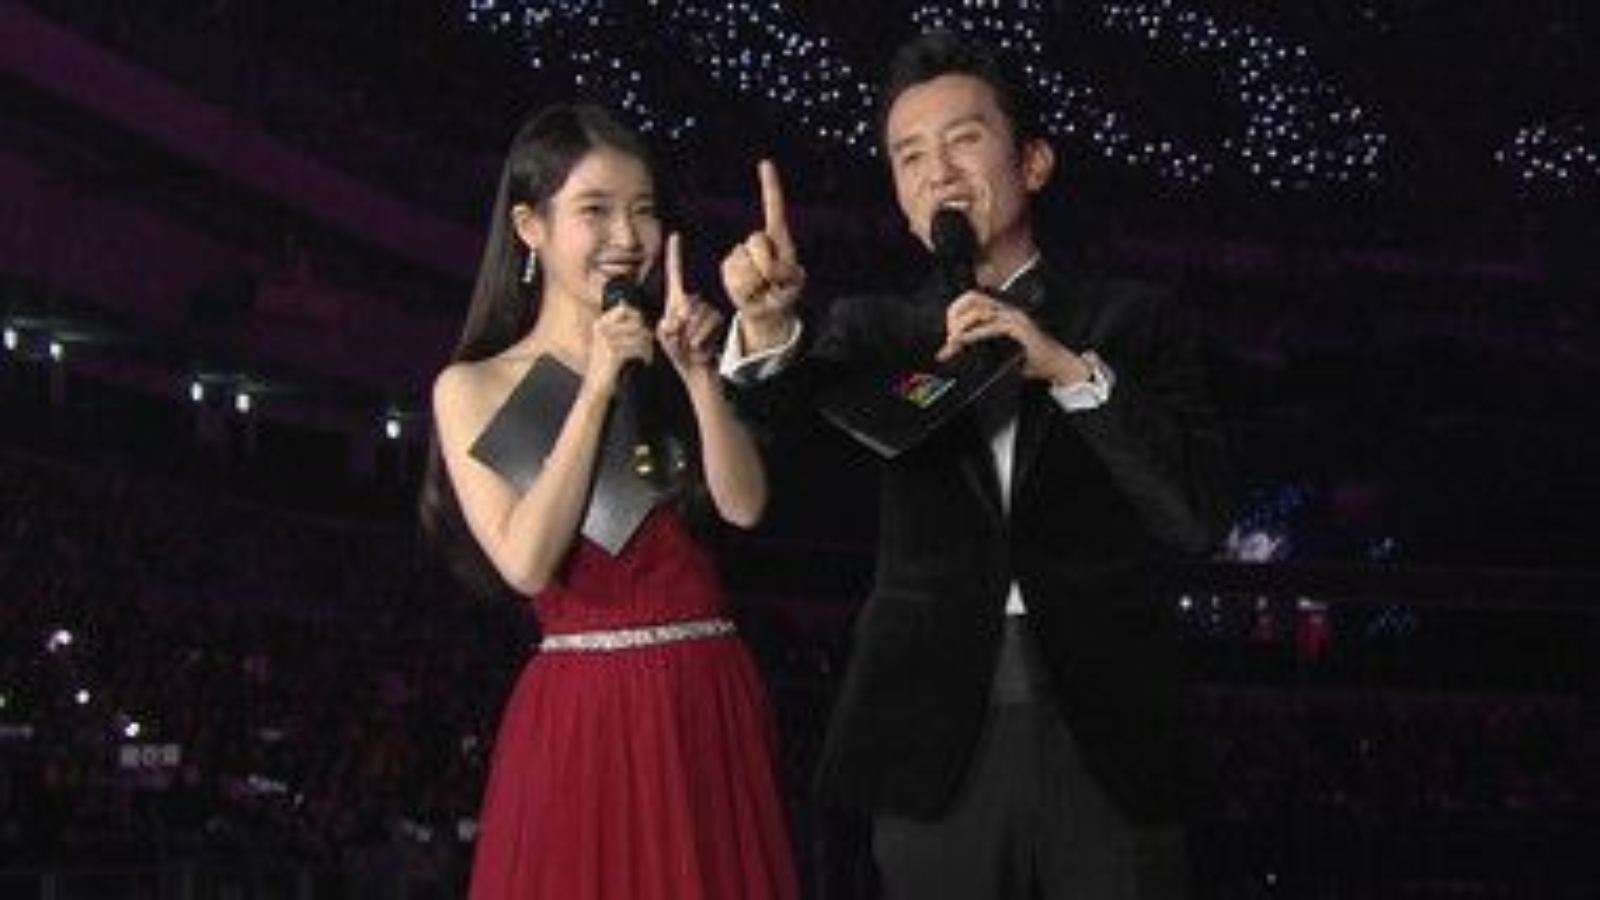 2017 SBS Gayo Daejeon_Music Festival Episodio 1